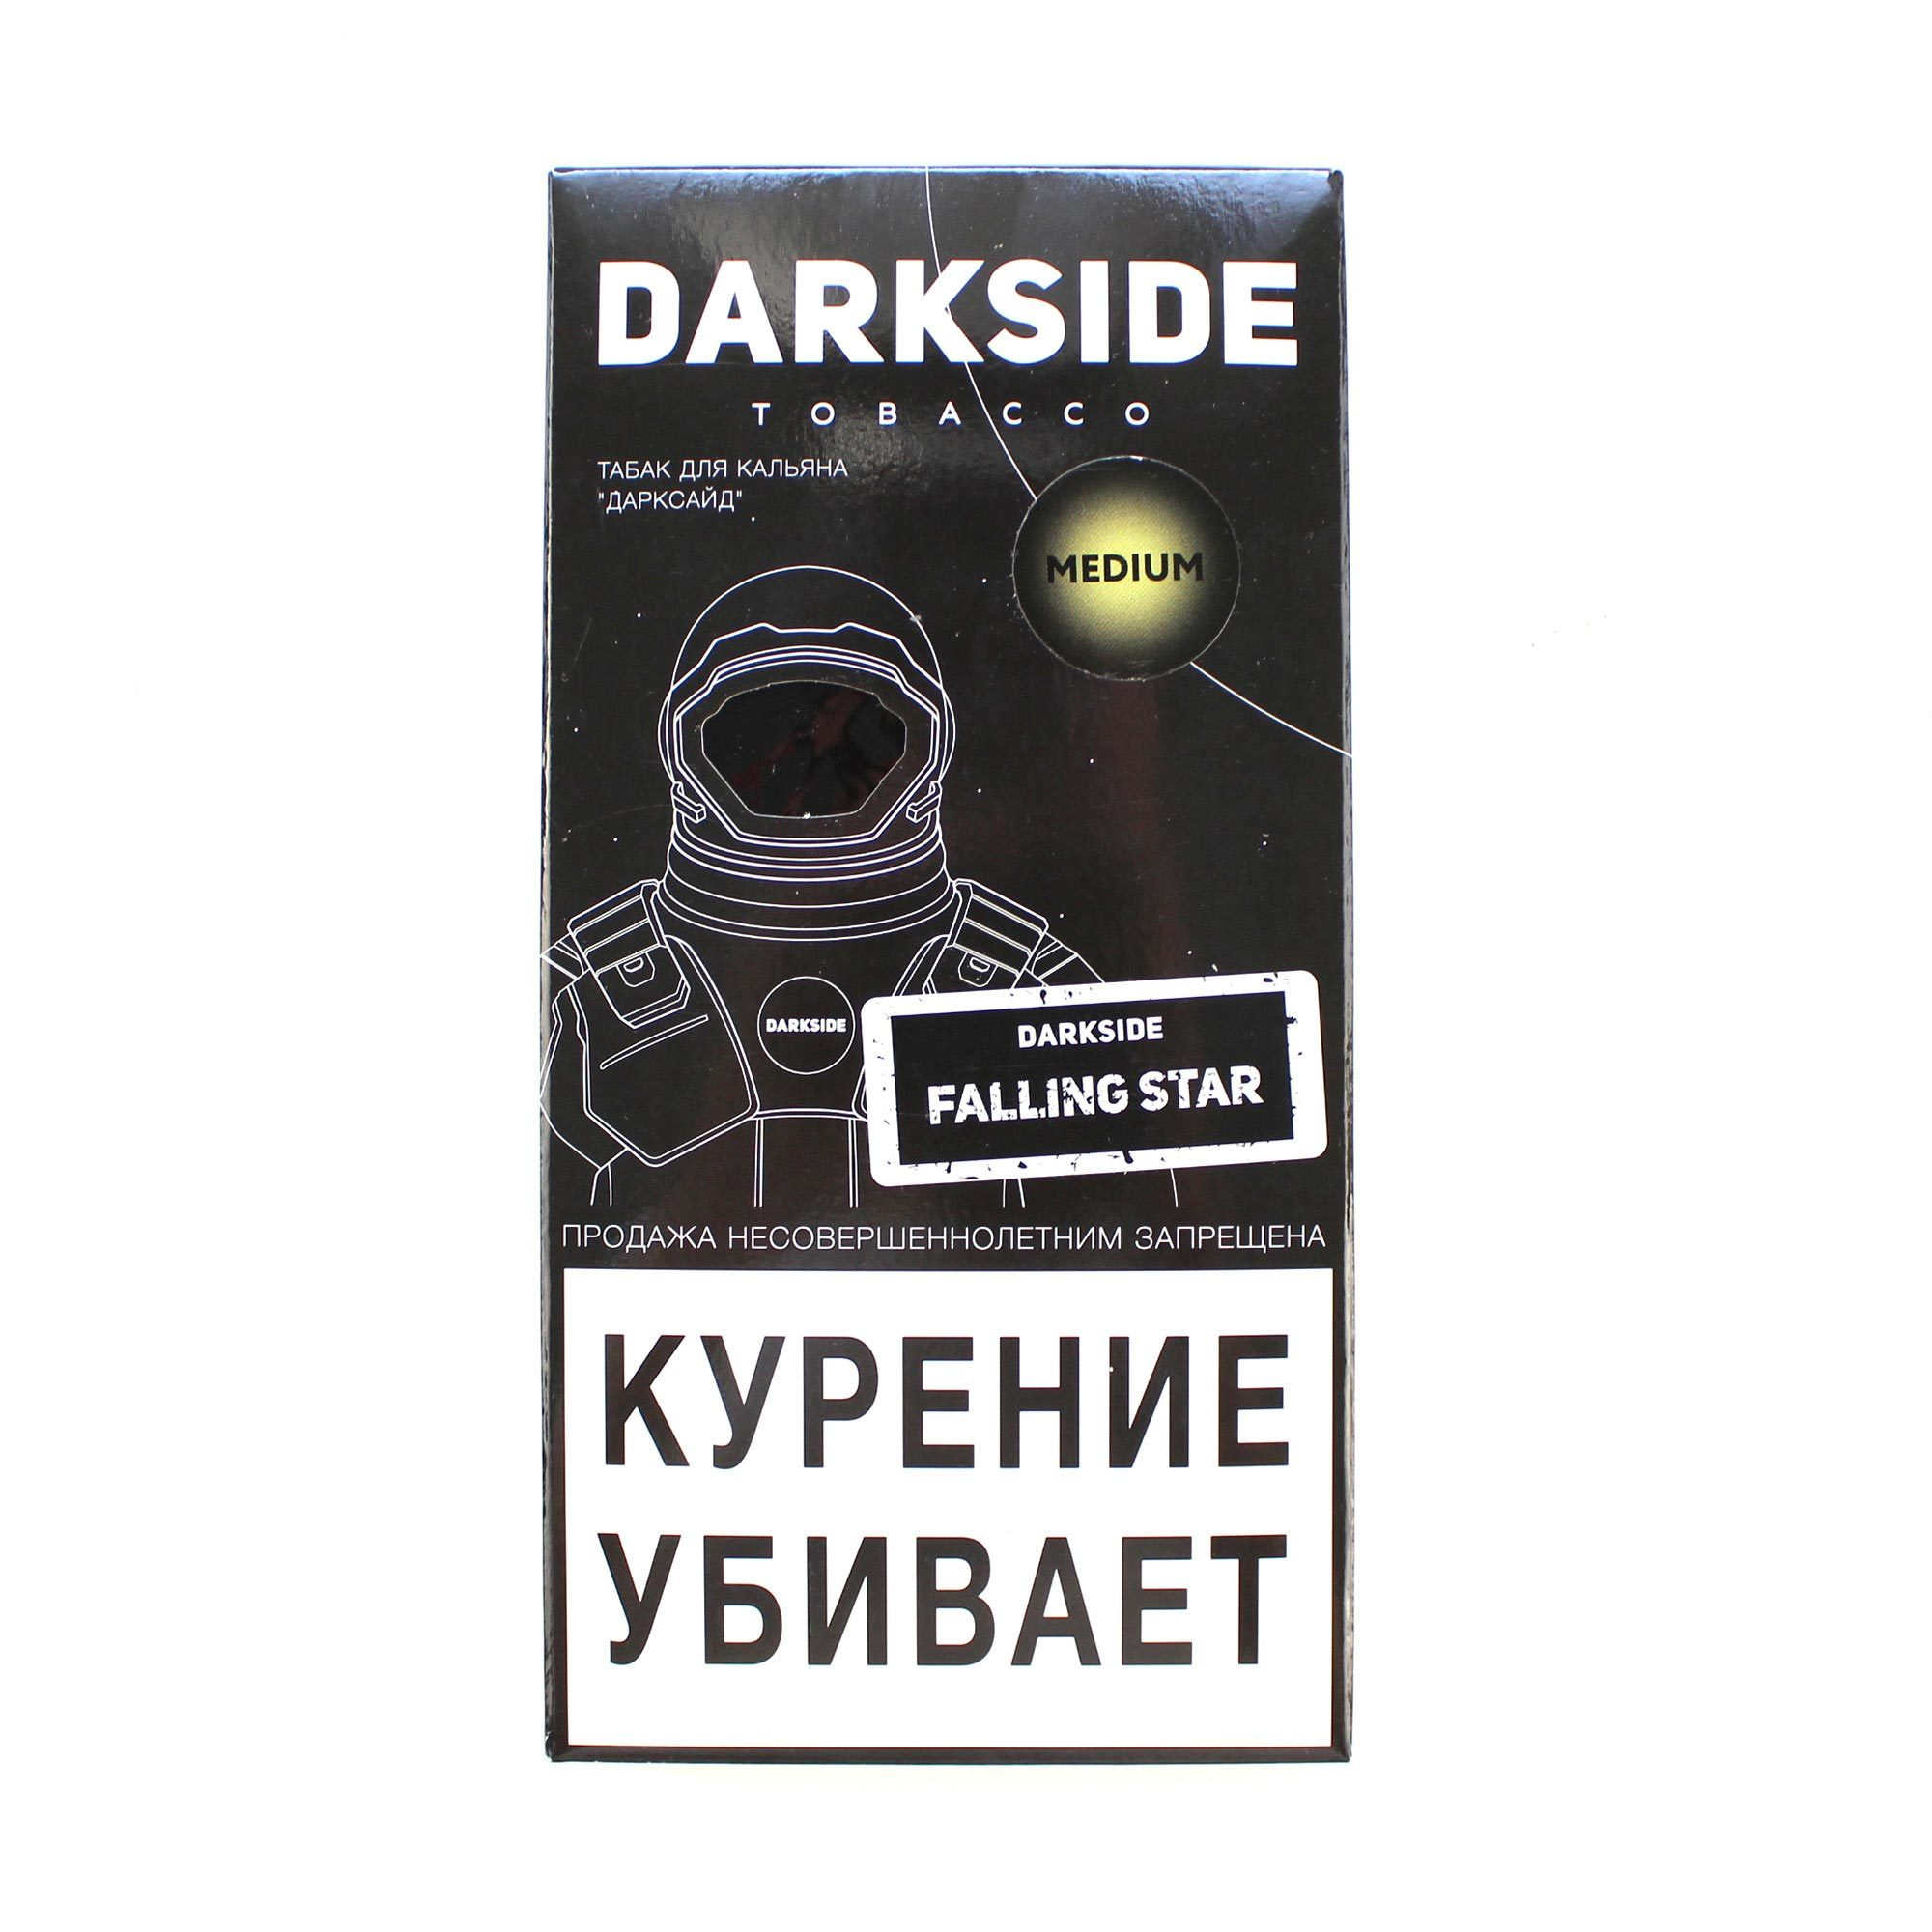 Табак для кальяна Dark Side Medium 250 гр.Falling star